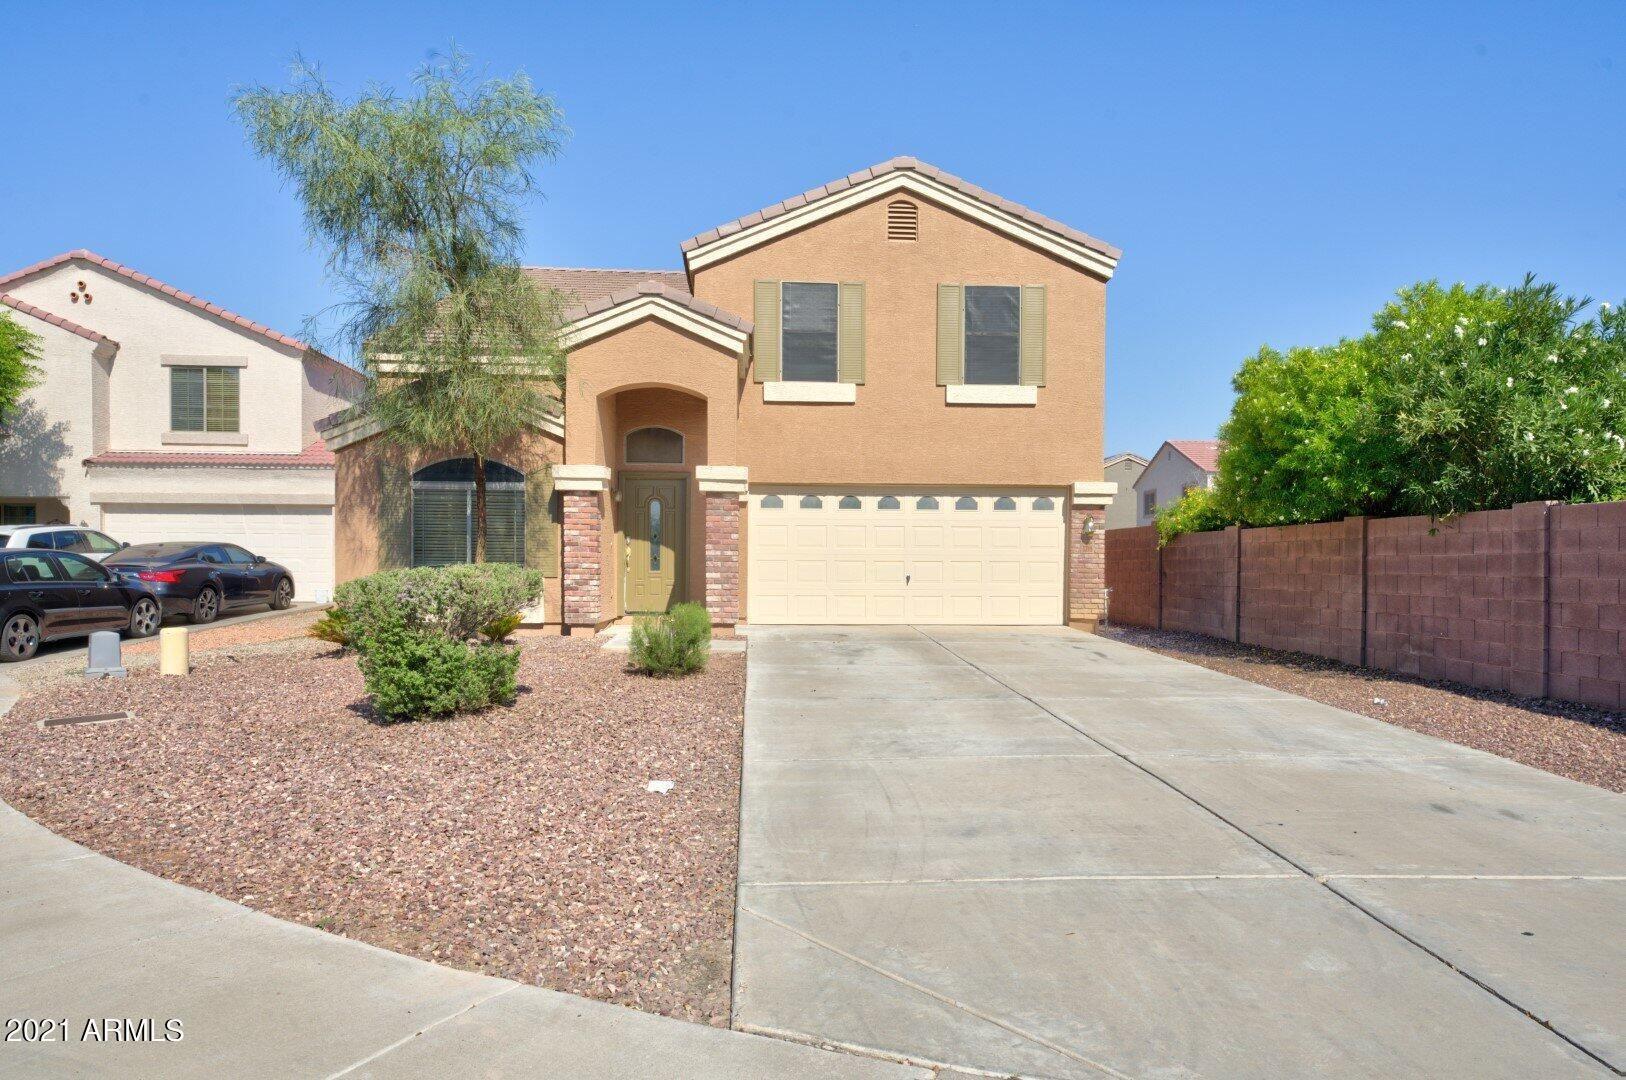 Photo of 3215 S 87TH Avenue, Tolleson, AZ 85353 (MLS # 6305169)